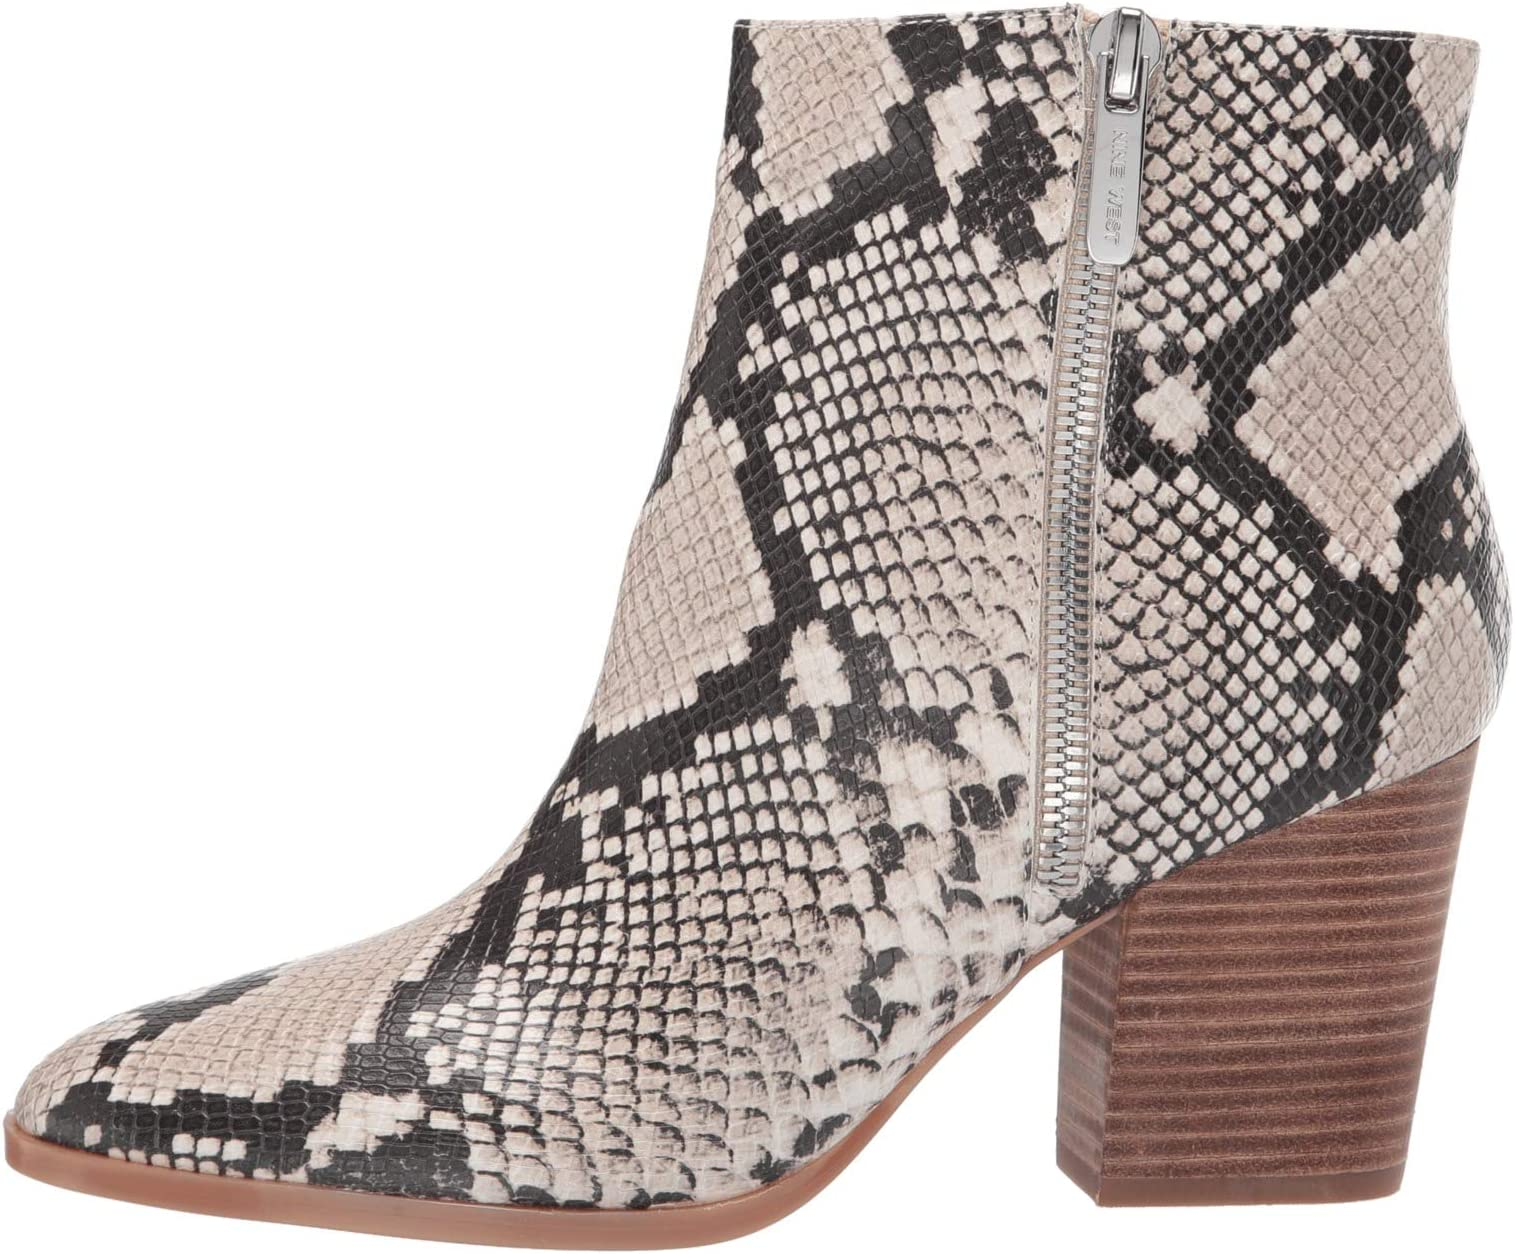 Nine West Niomi 3 | Women's shoes | 2020 Newest